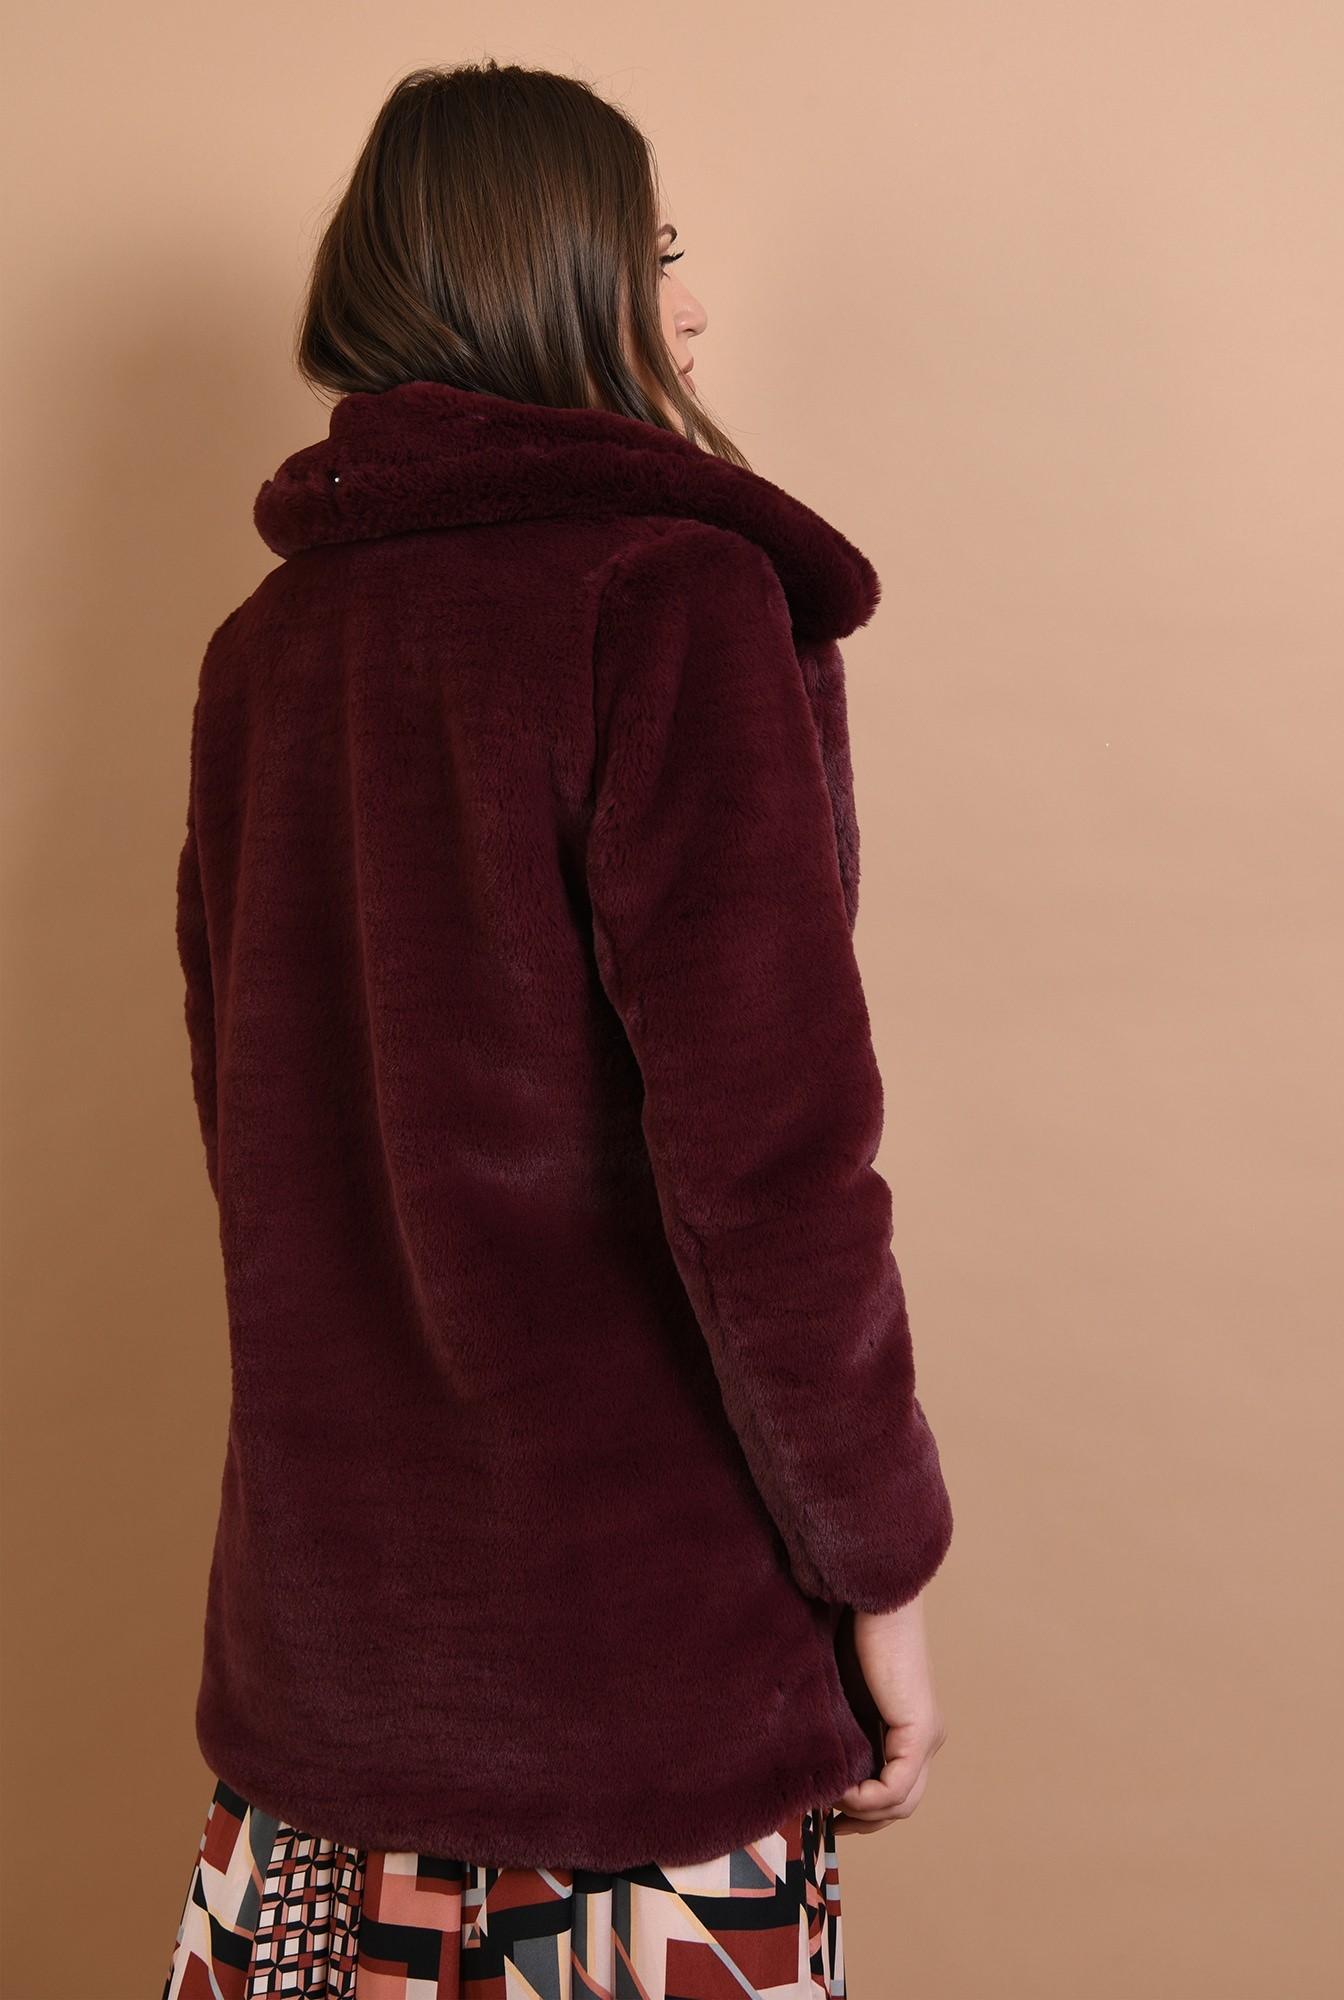 1 - jacheta din blana, grena, scurta, cu revere, Poema